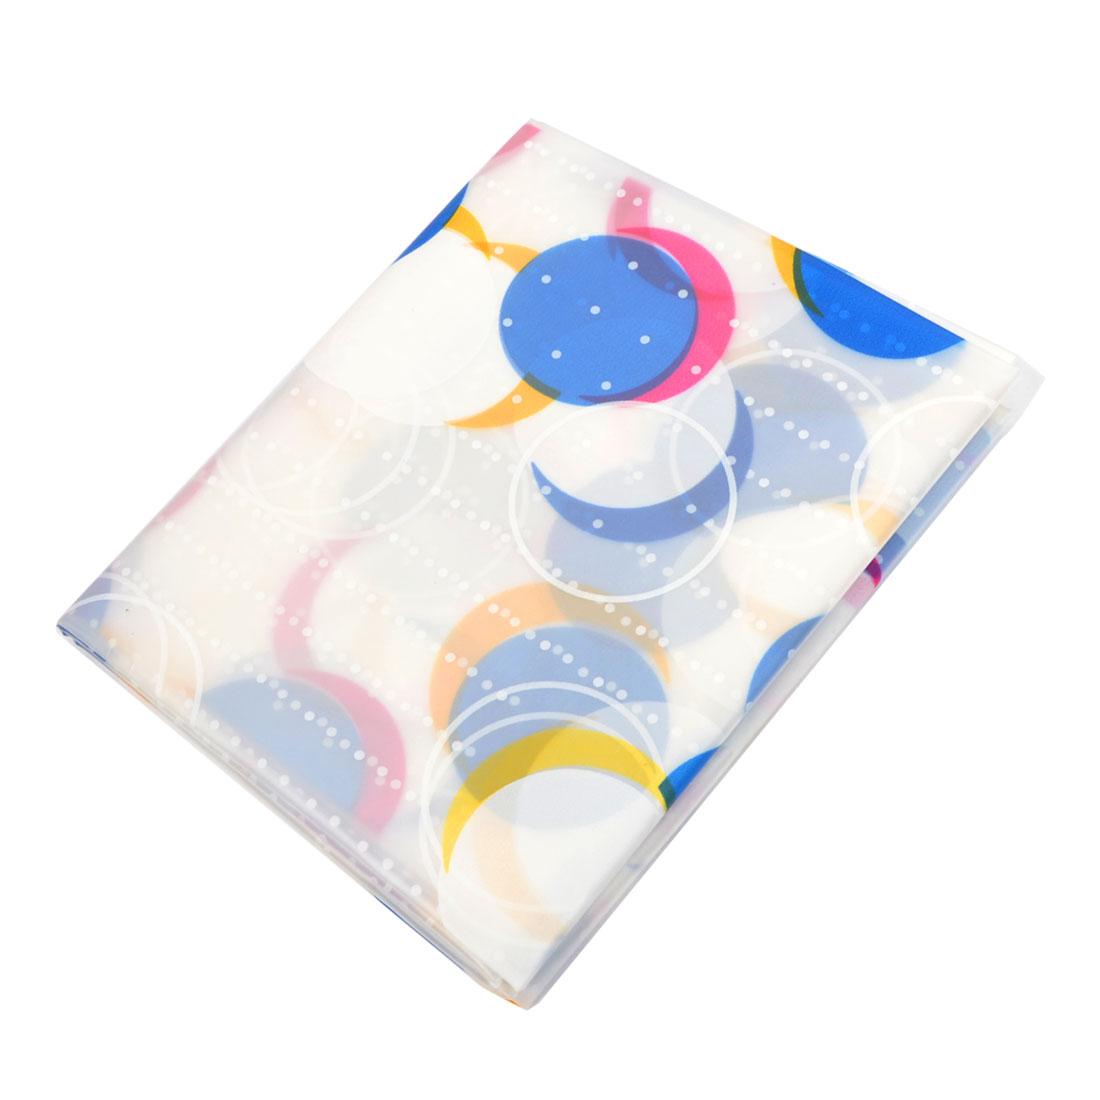 Water Resistant Dot Pattern Bath Shower Curtain 180cm x 180cm w Hooks Rings